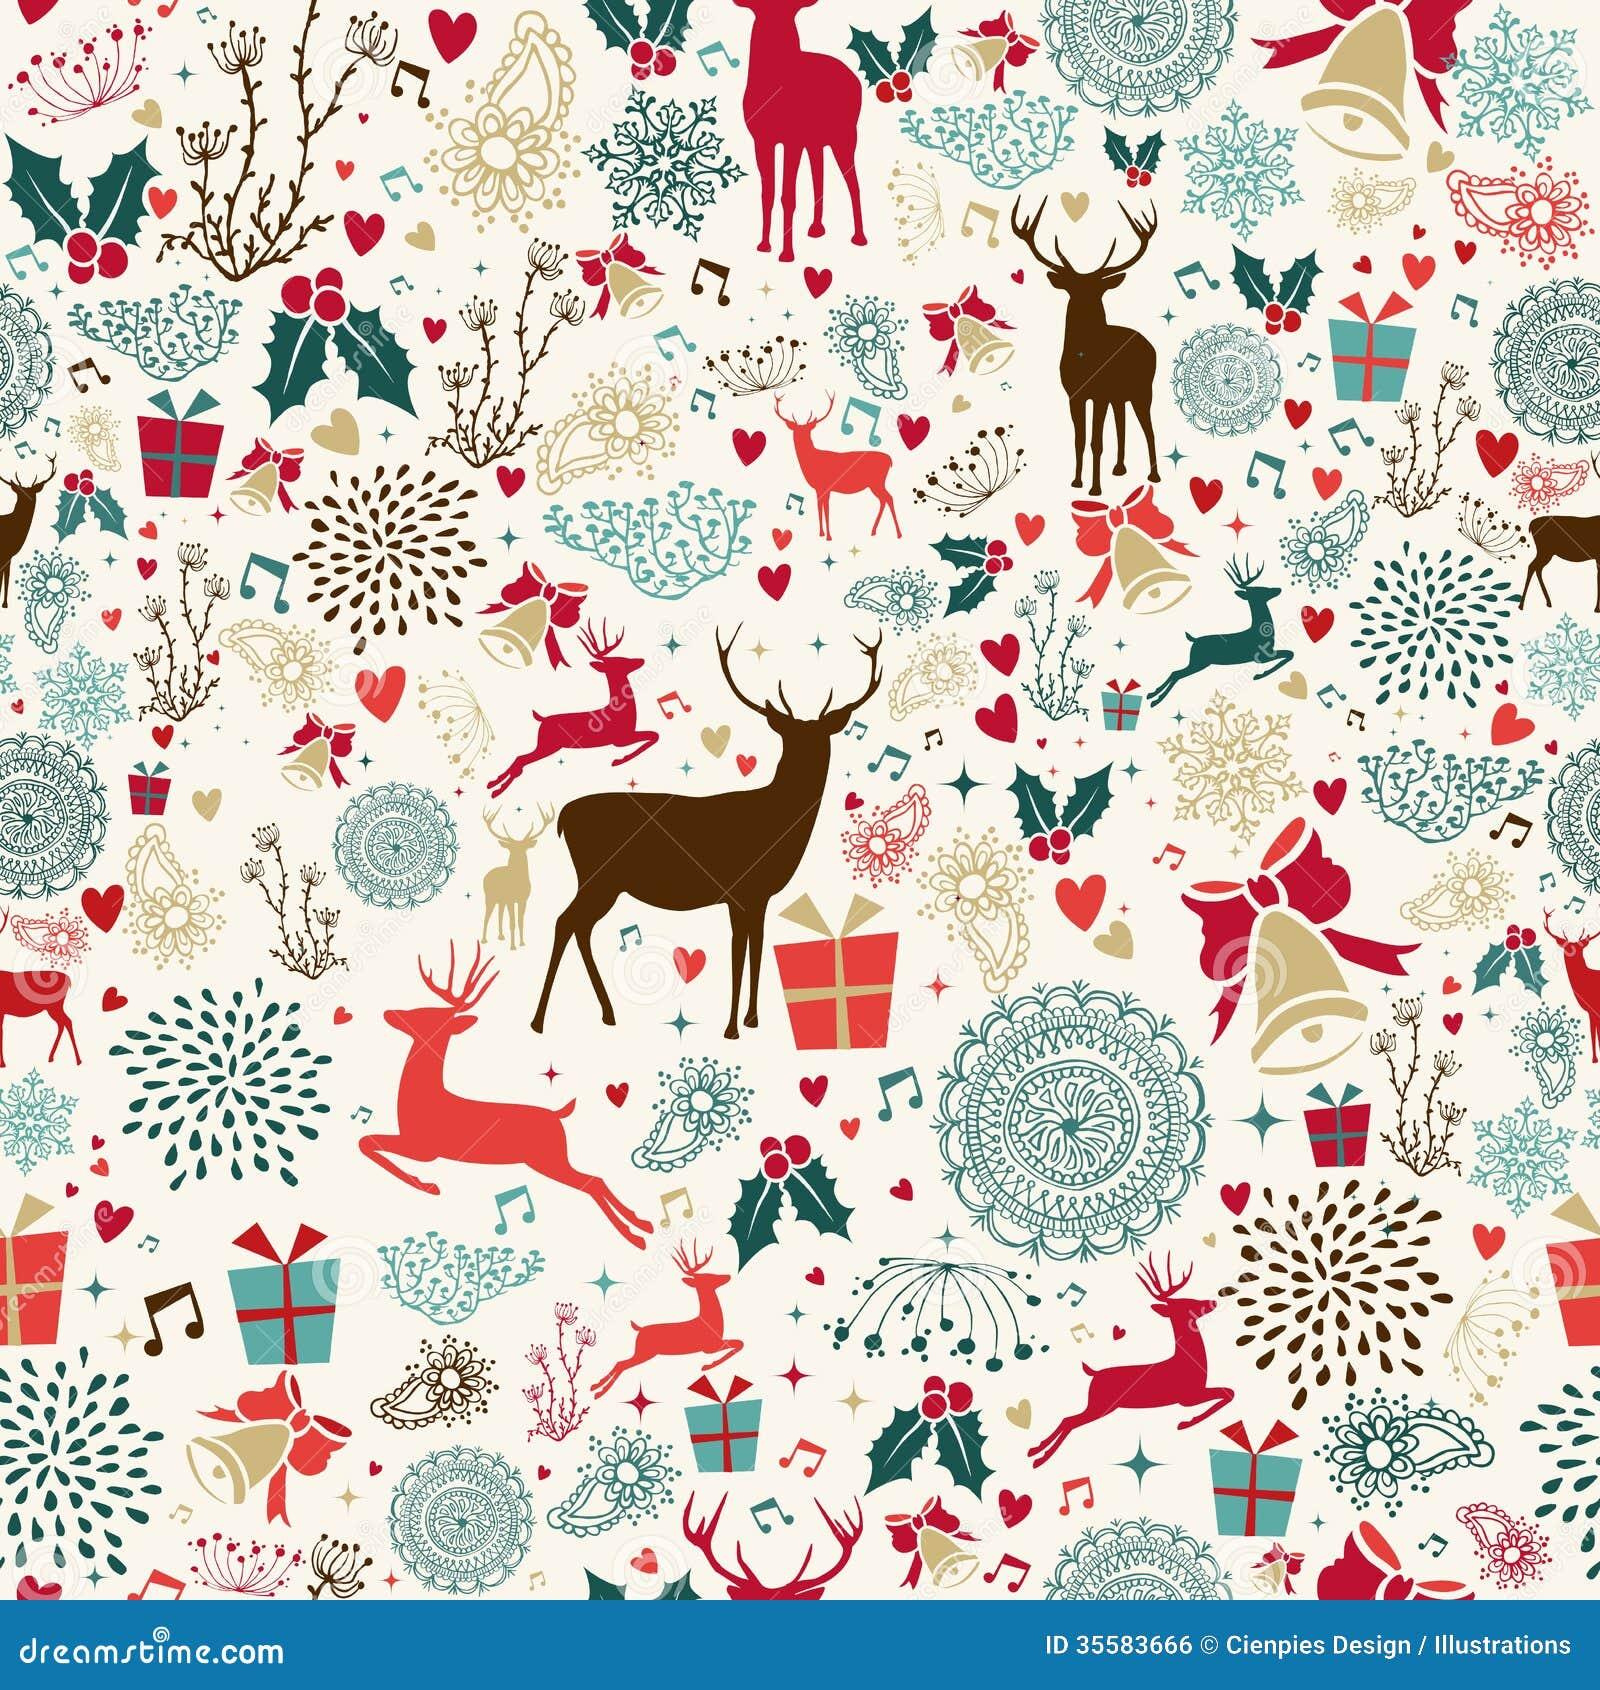 Vintage Christmas elements seamless pattern wrapping background  EPS10    Vintage Christmas Pattern